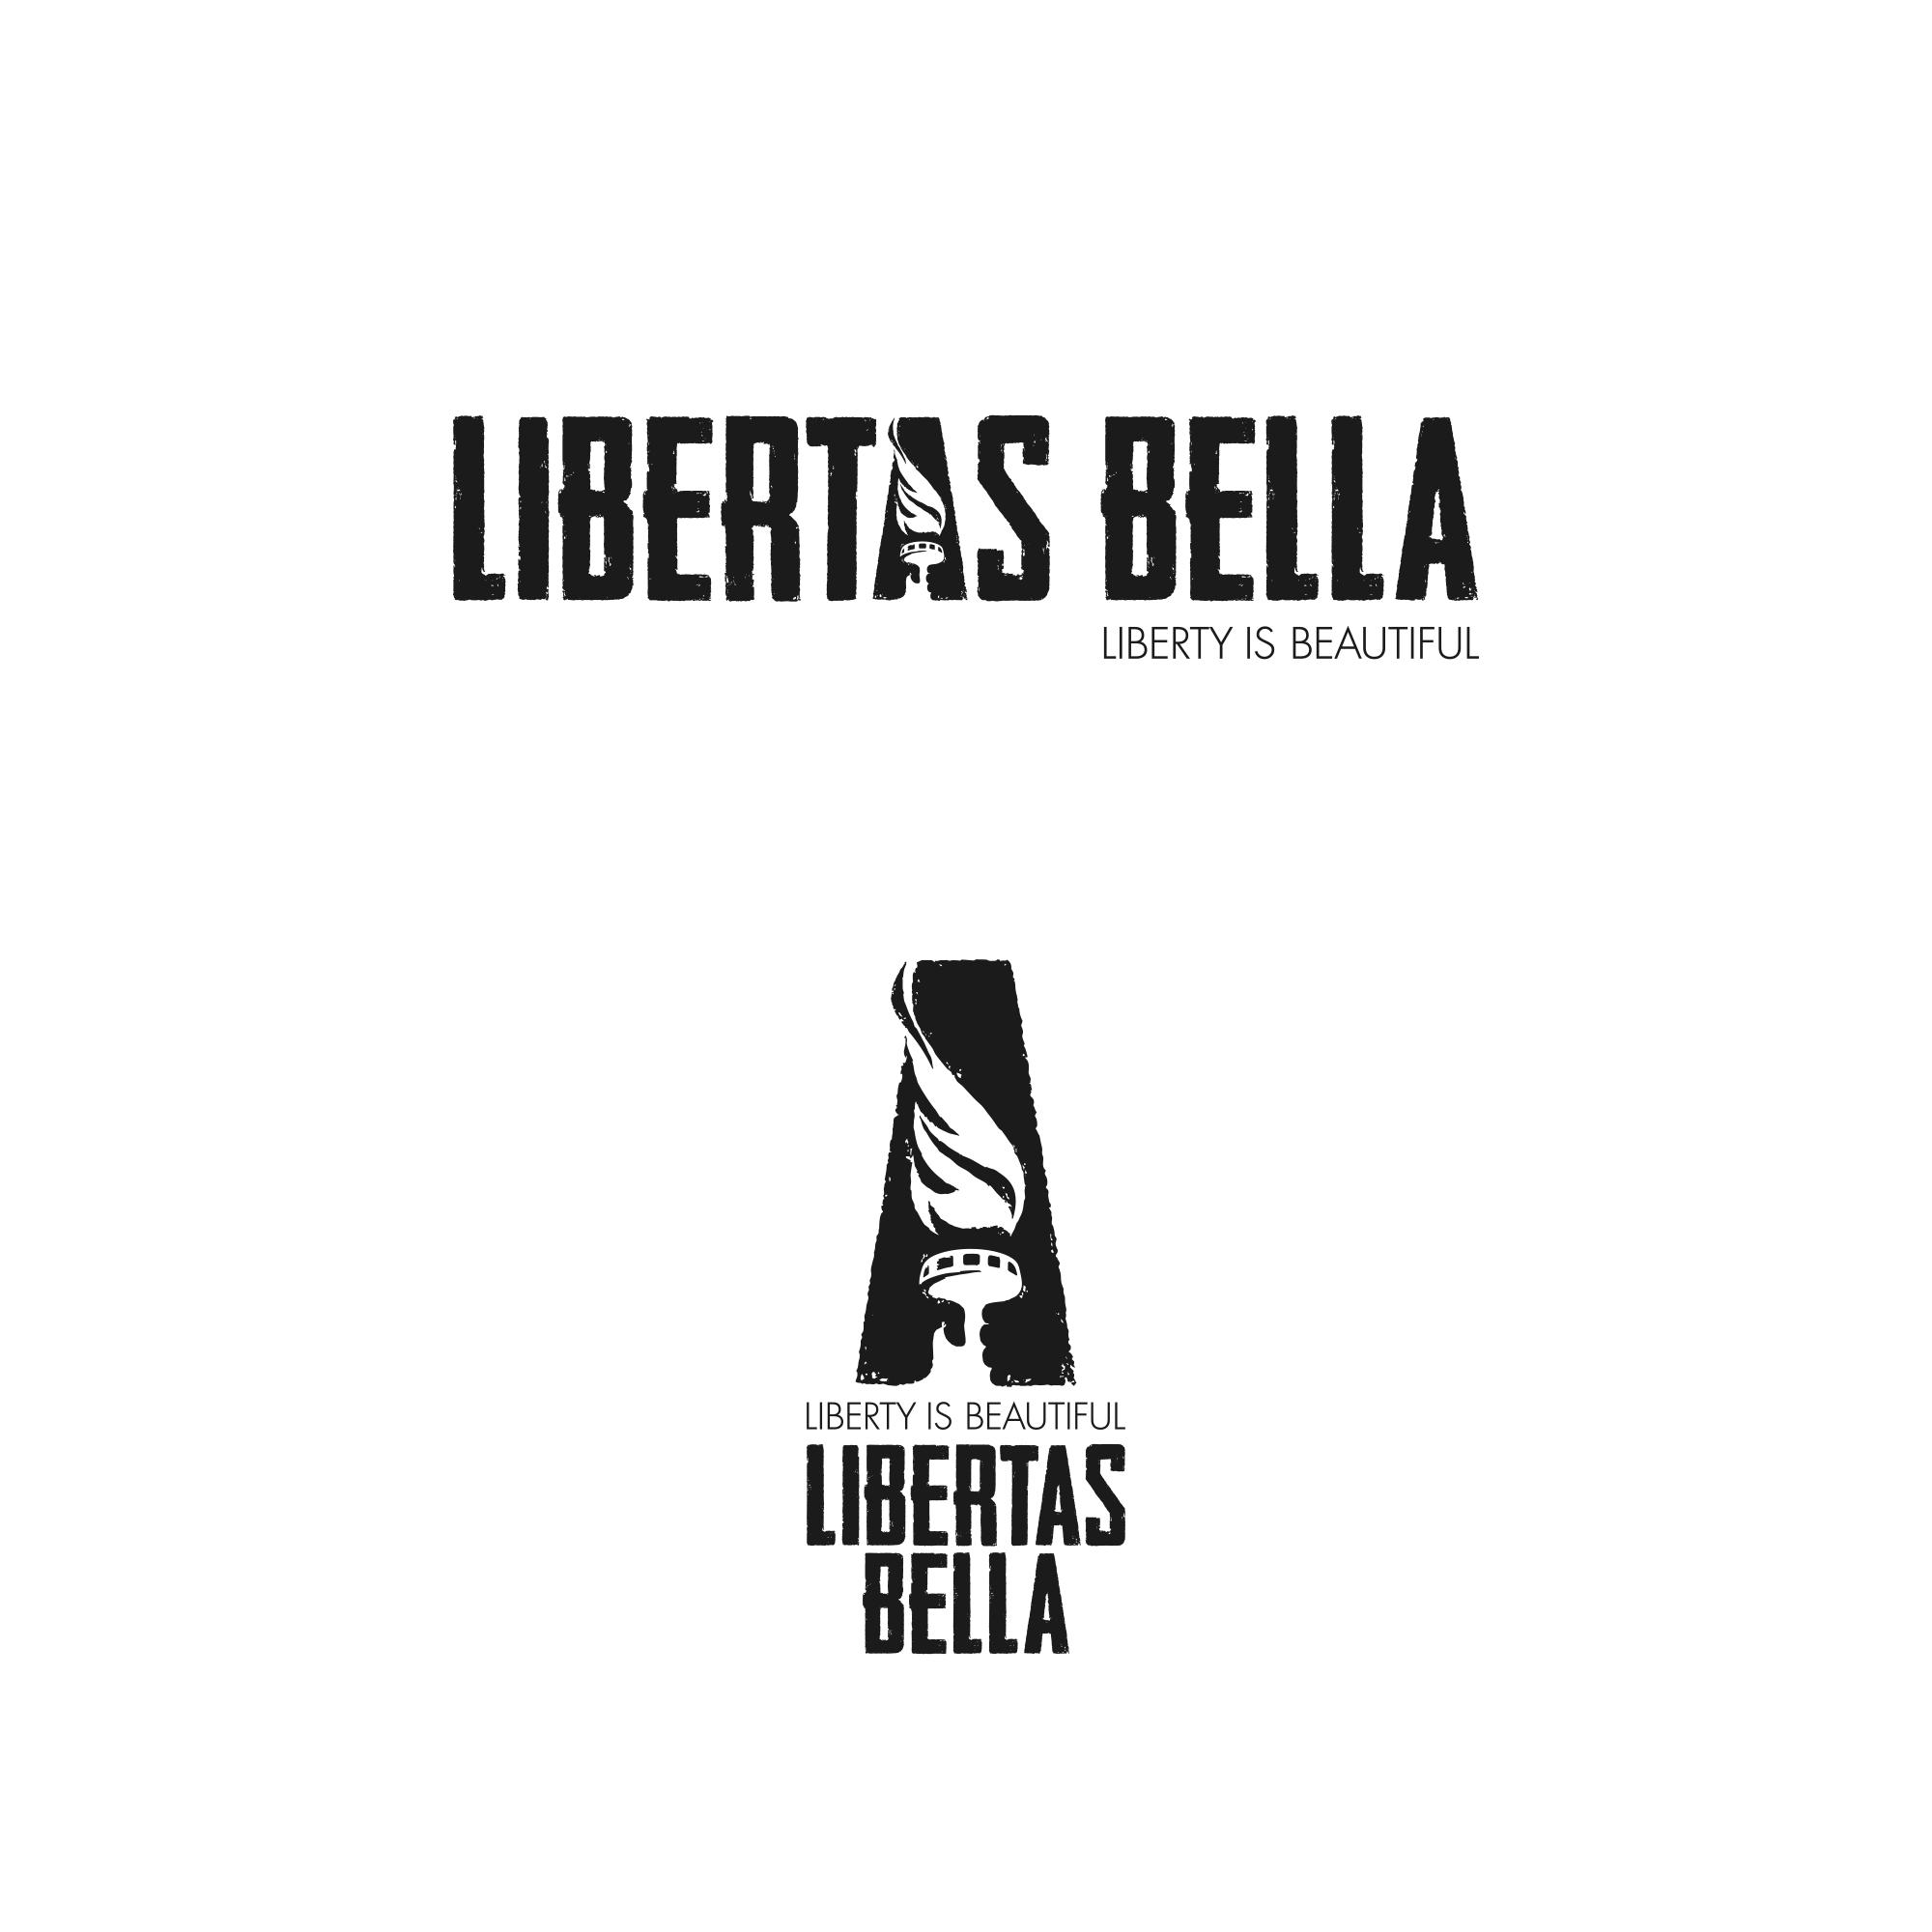 Libertas Bella 001